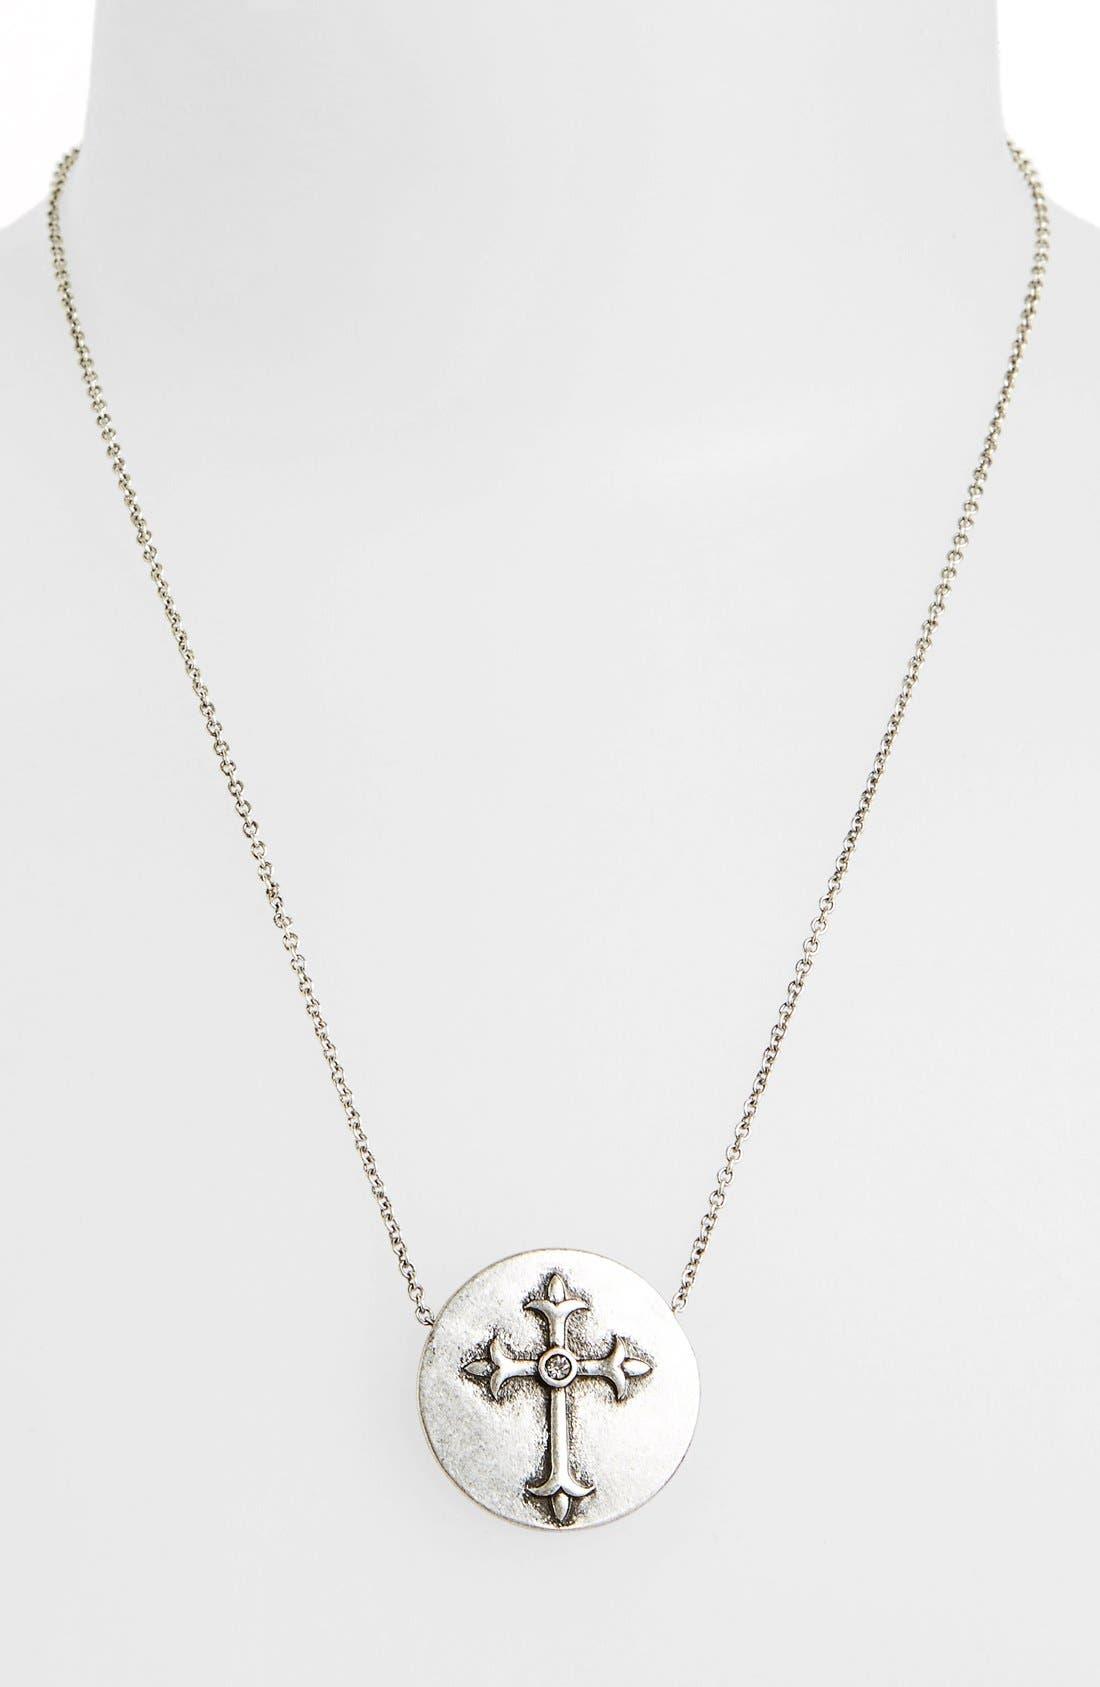 Main Image - Berry 'Cross' Pendant Necklace